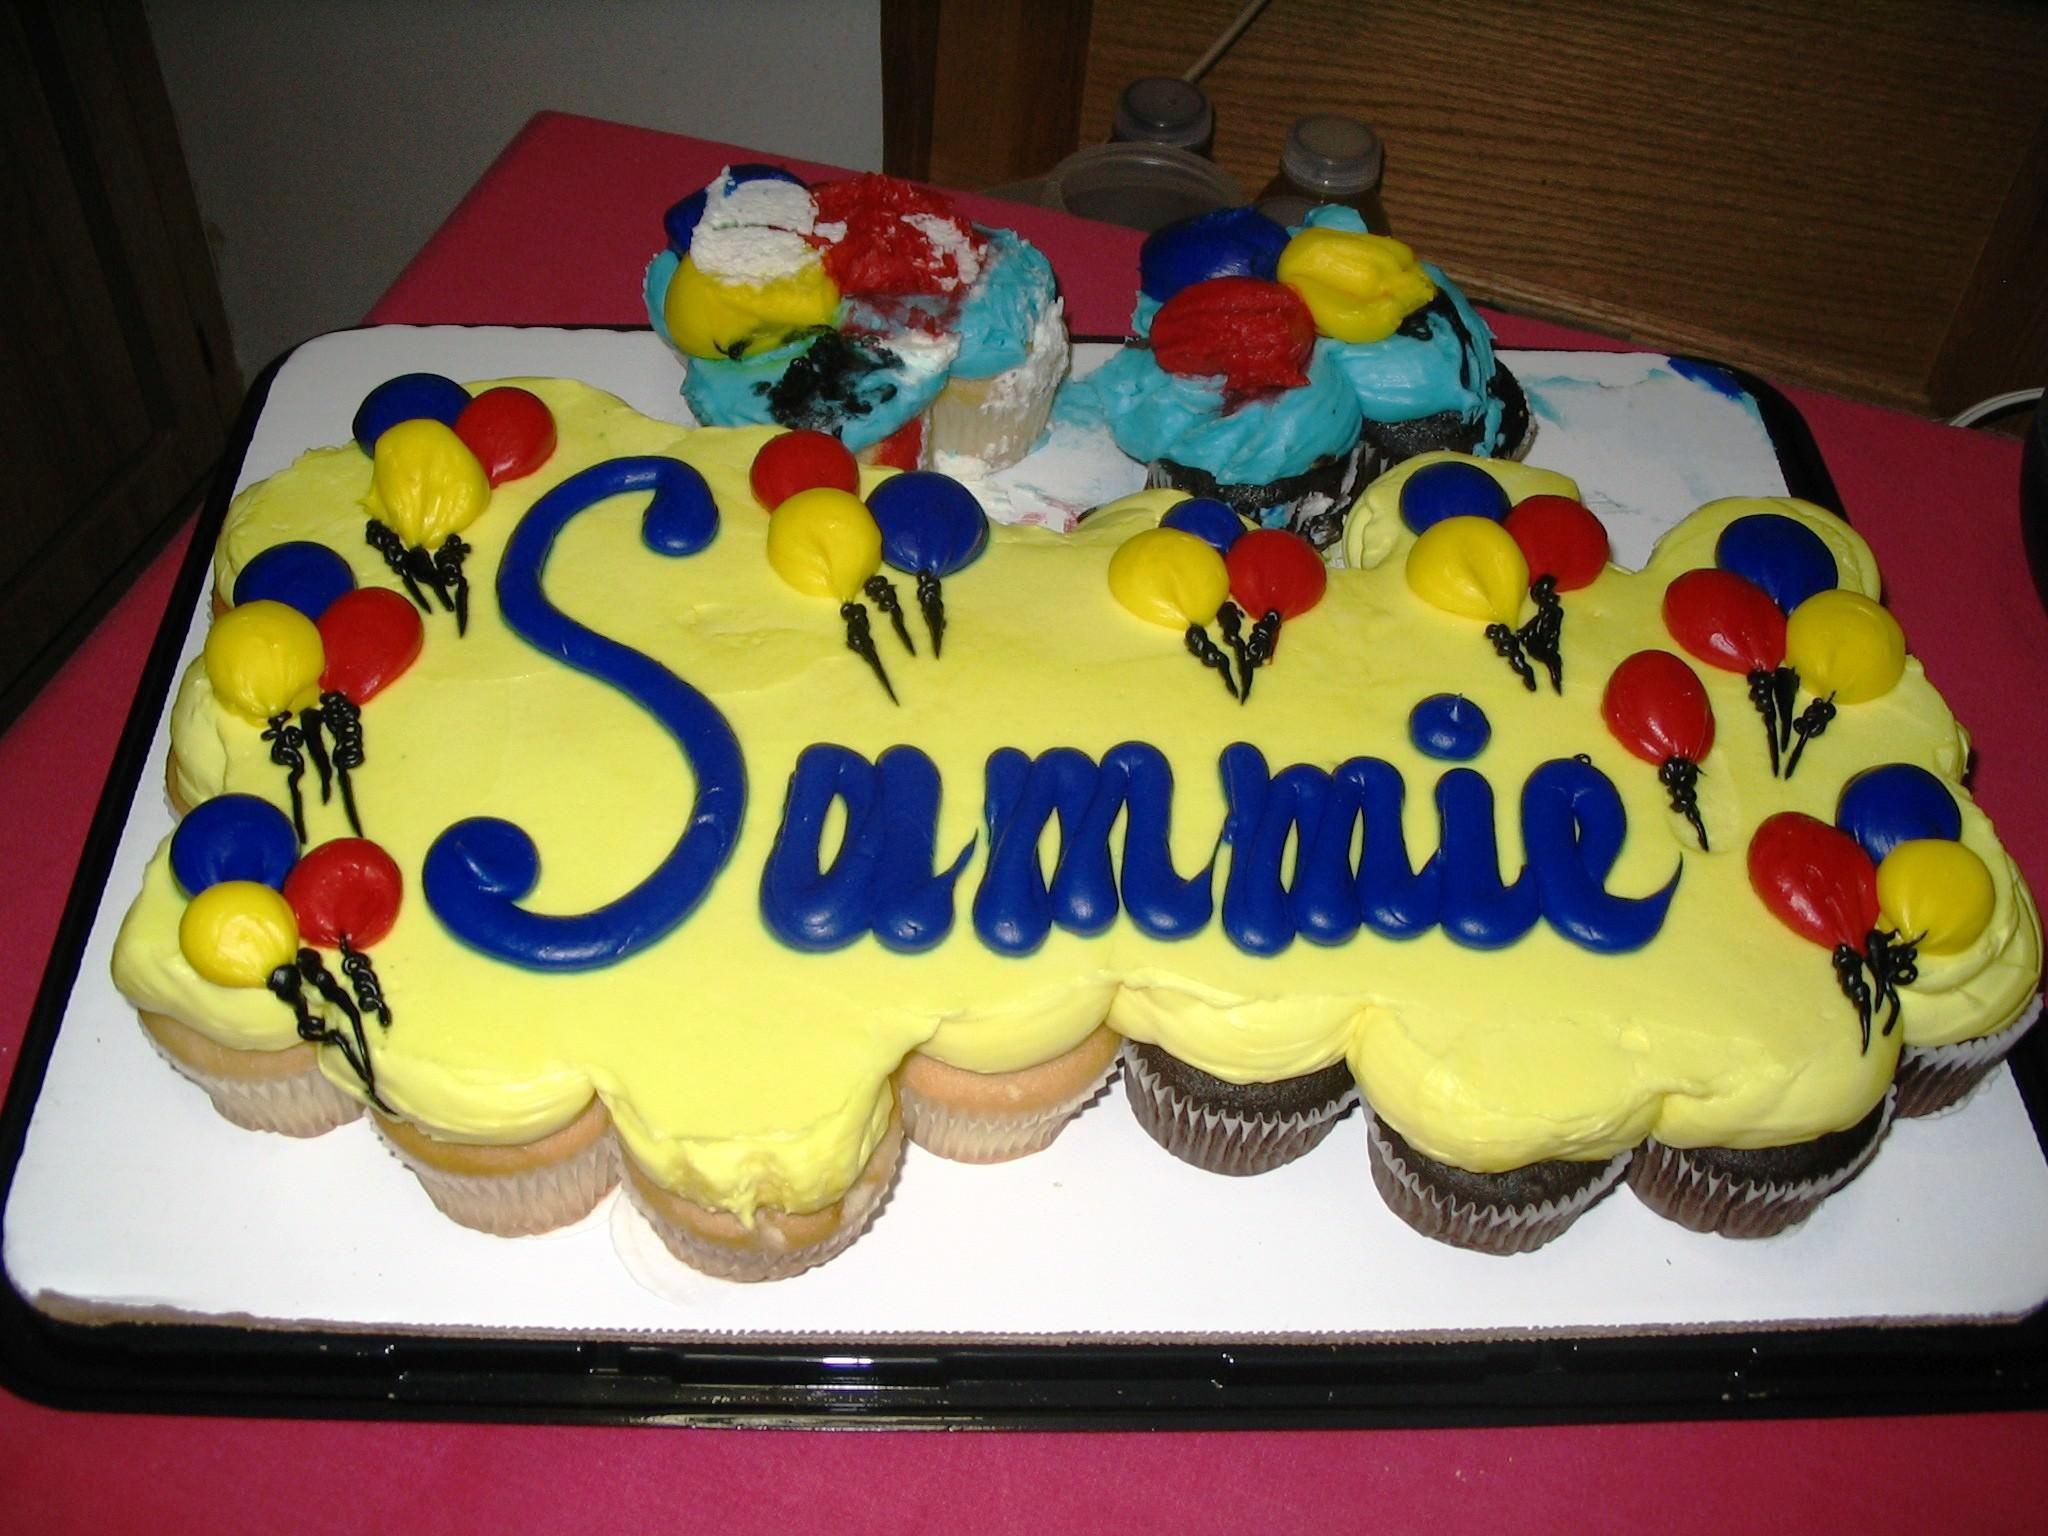 20 Marvelous Image Of Sams Club Bakery Birthday Cakes 8 Safeway For Girls Photo Cake